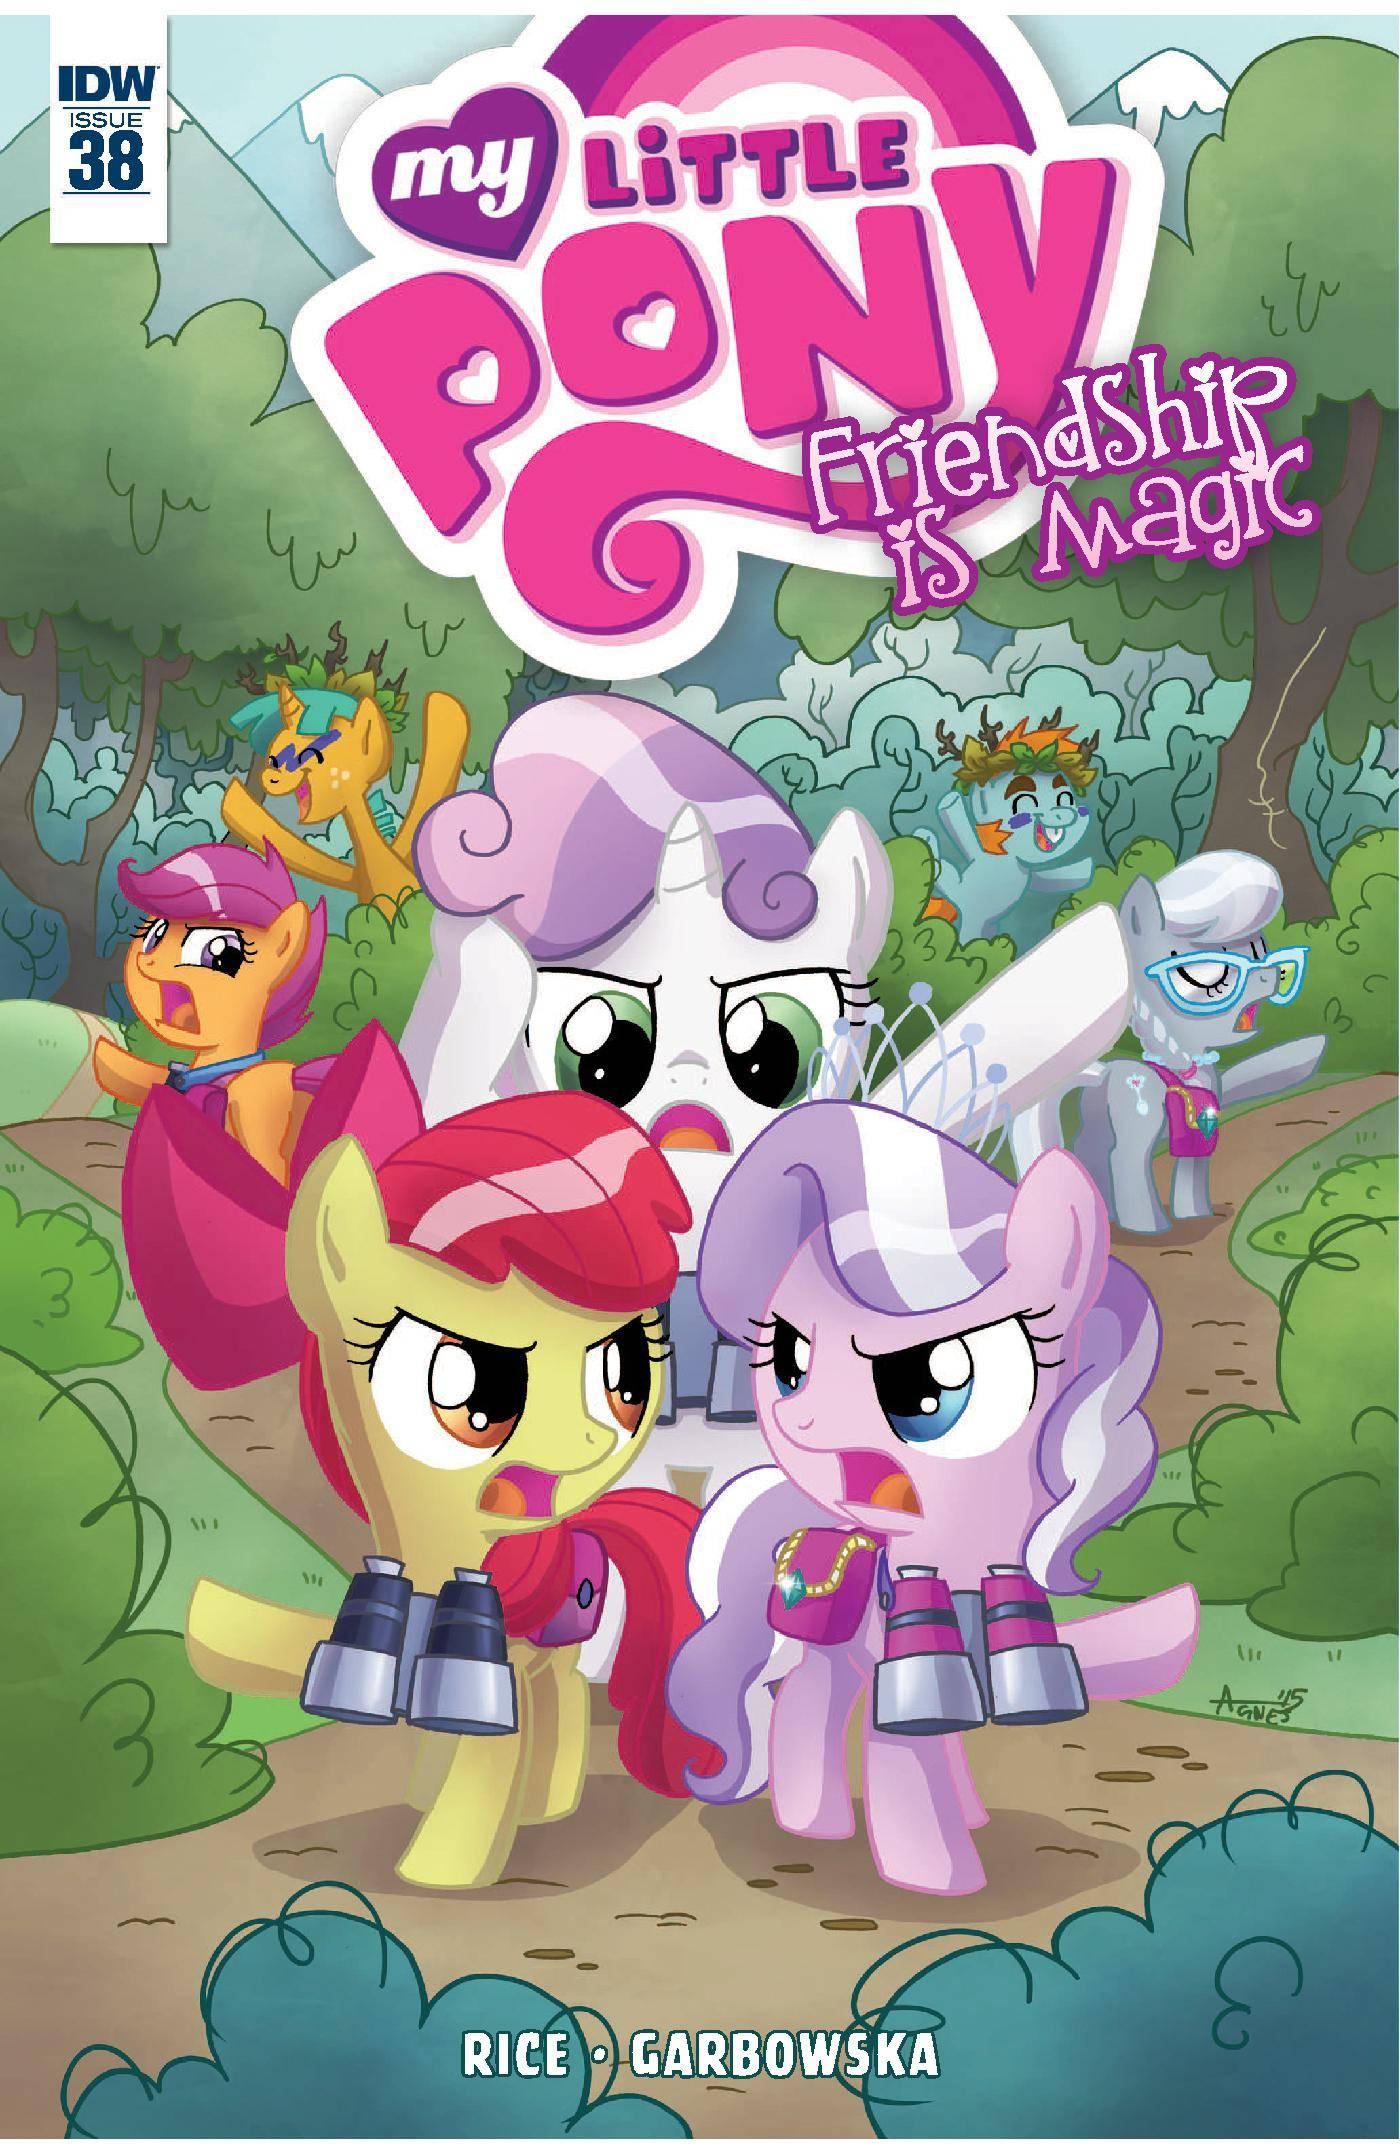 My Little Pony - Friendship Is Magic 038 2015 digital